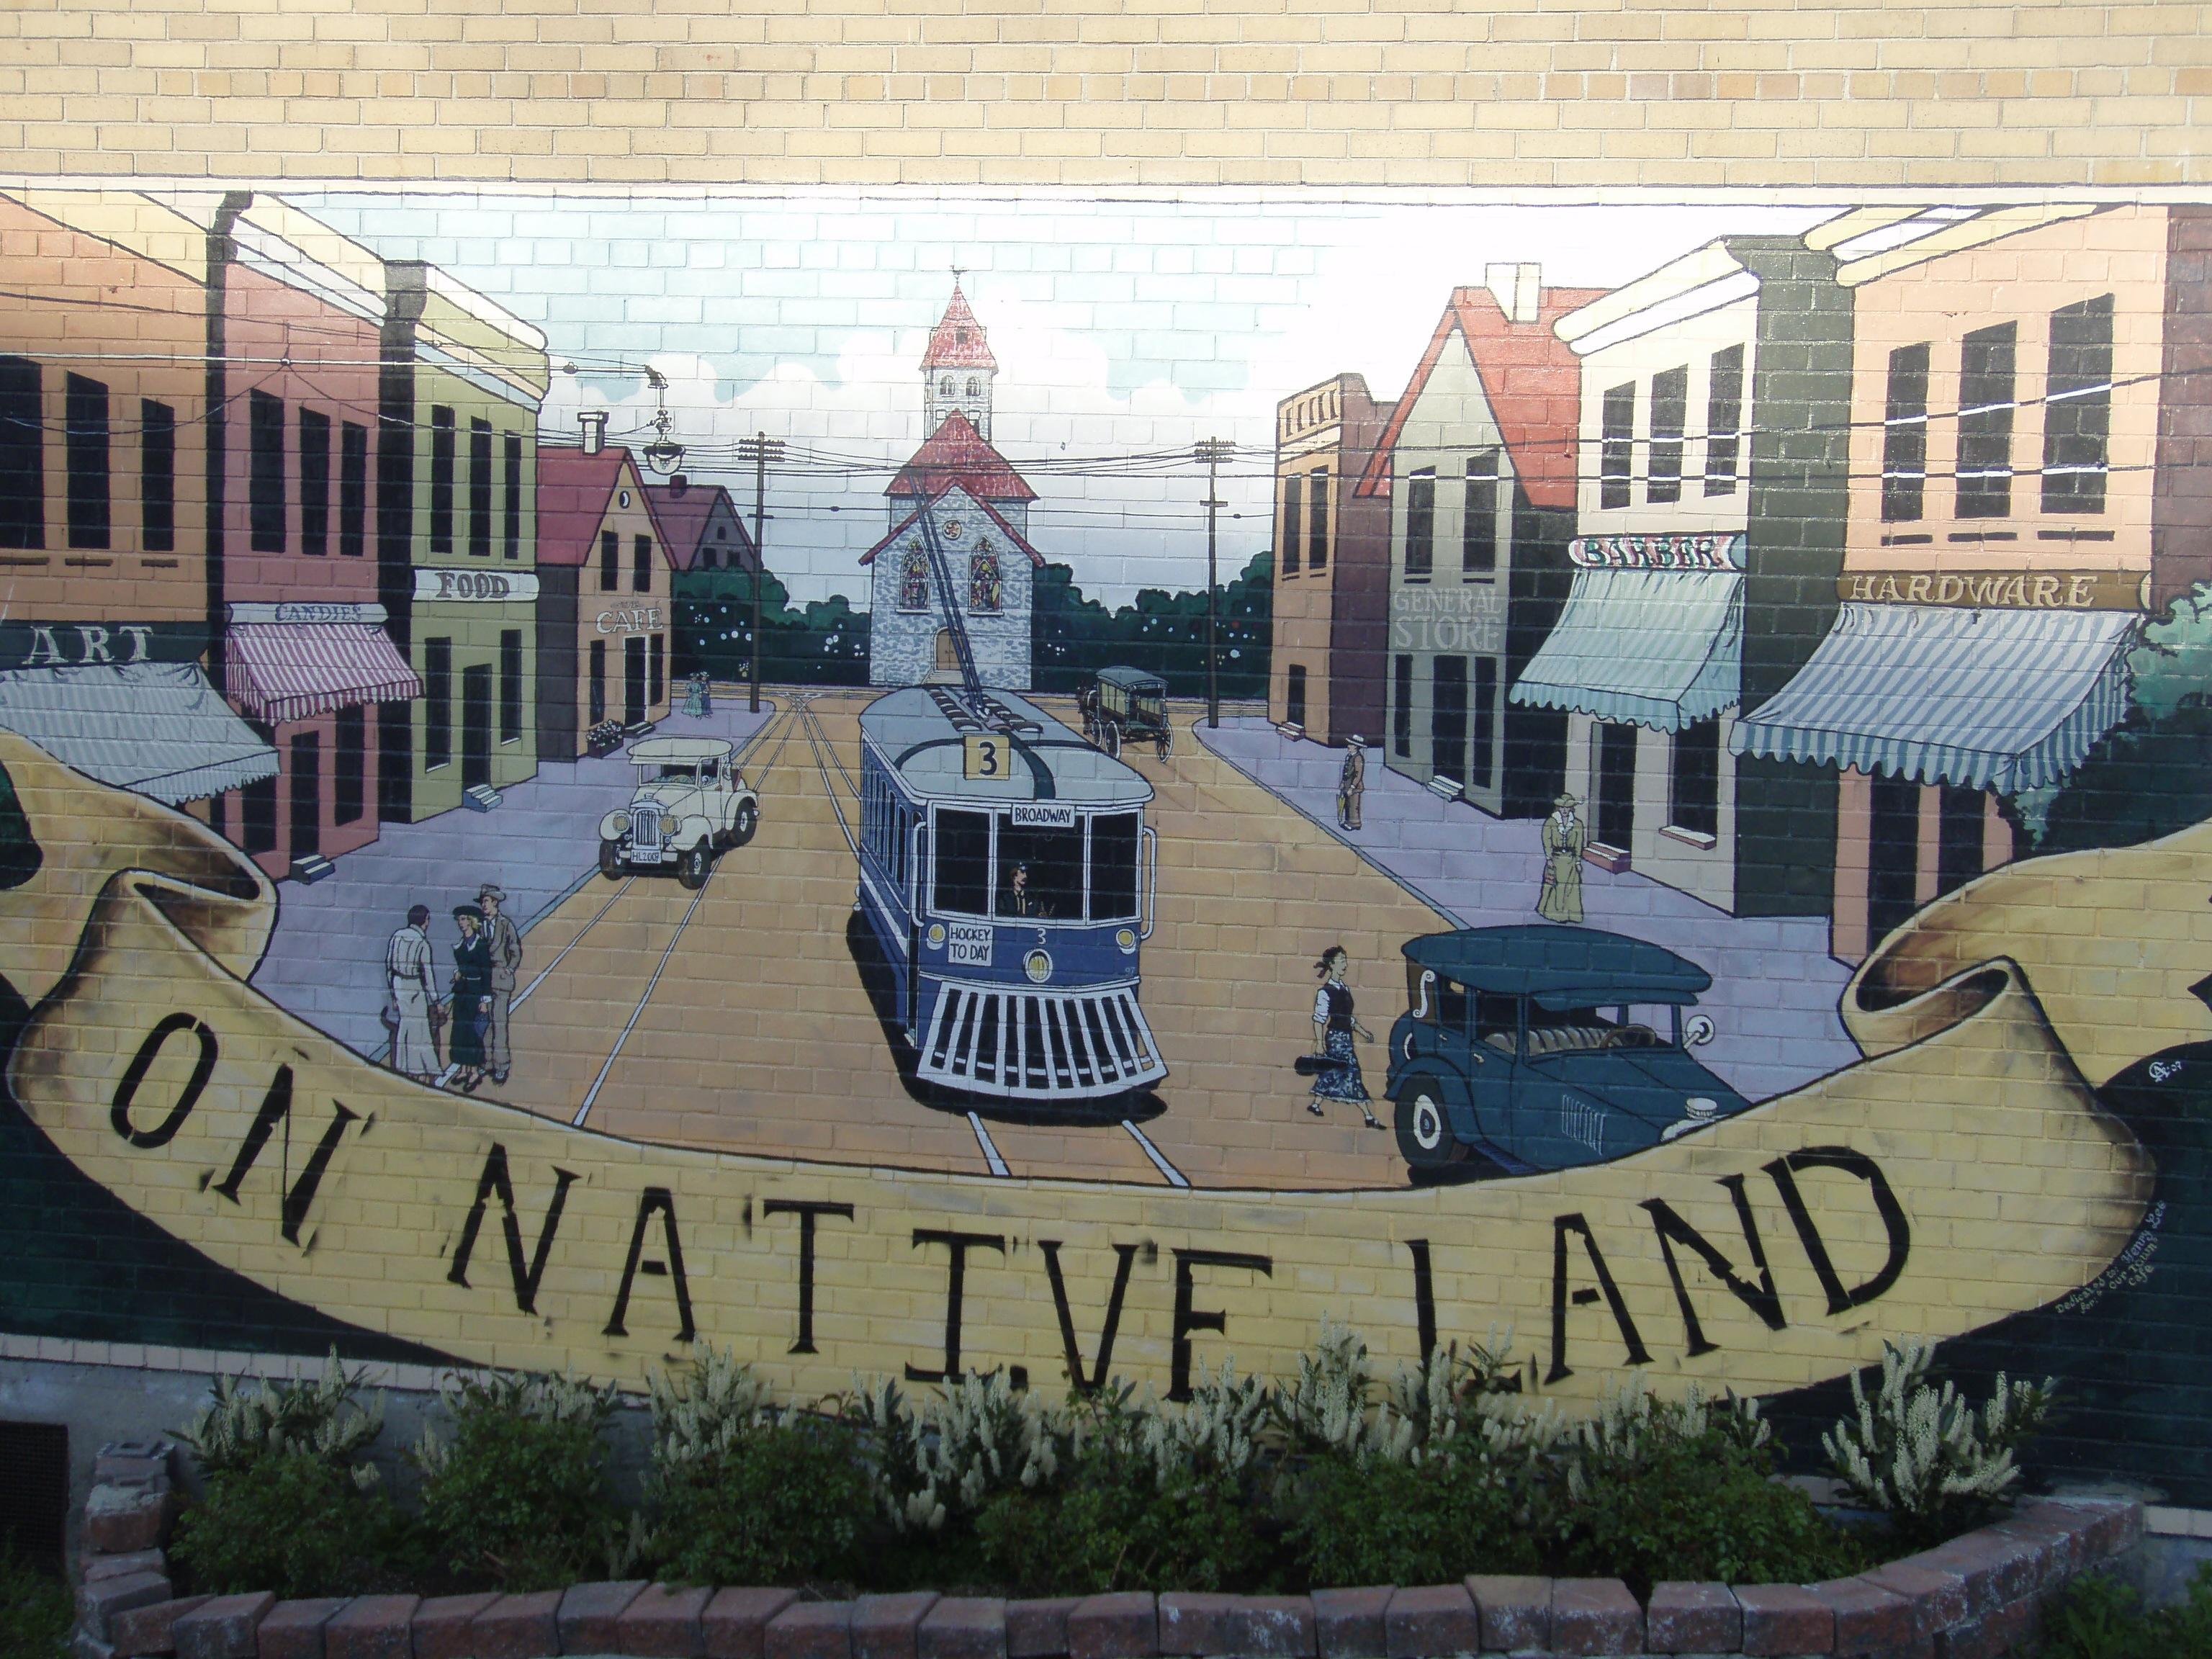 On Native Land